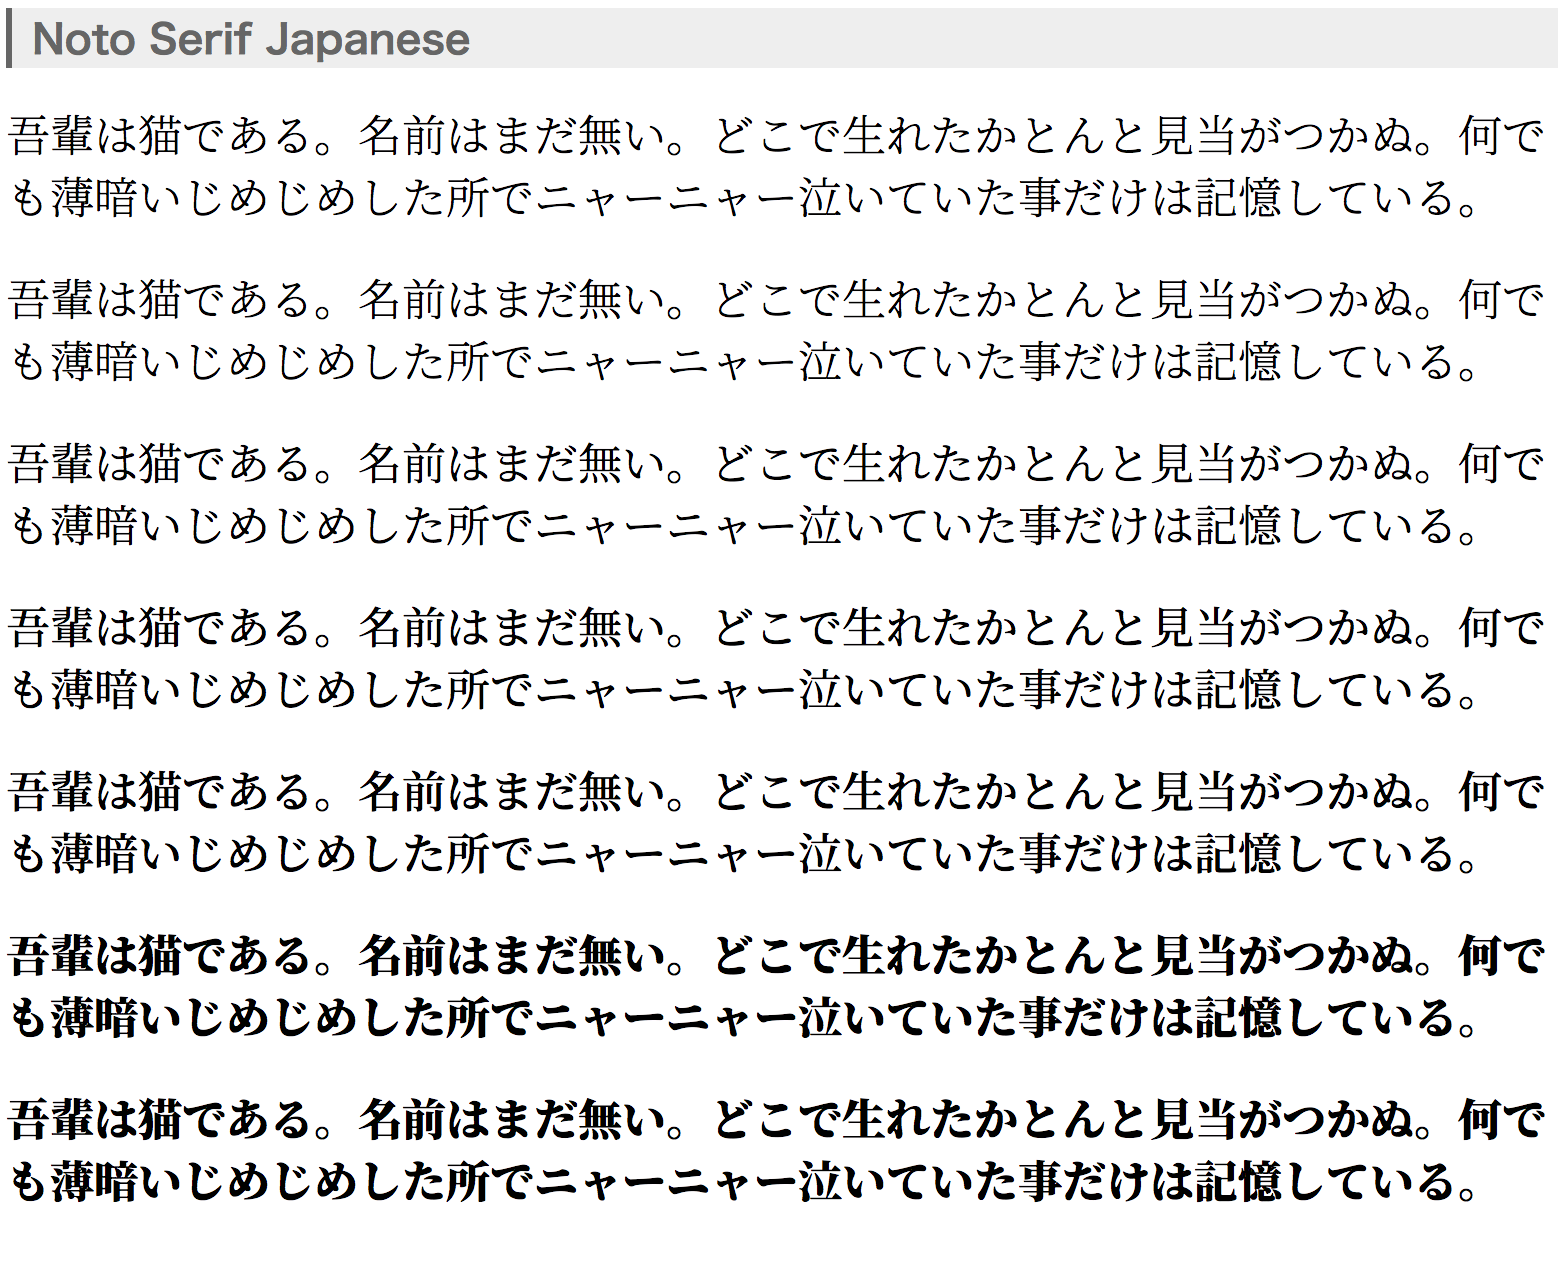 weight_noto_serif.png